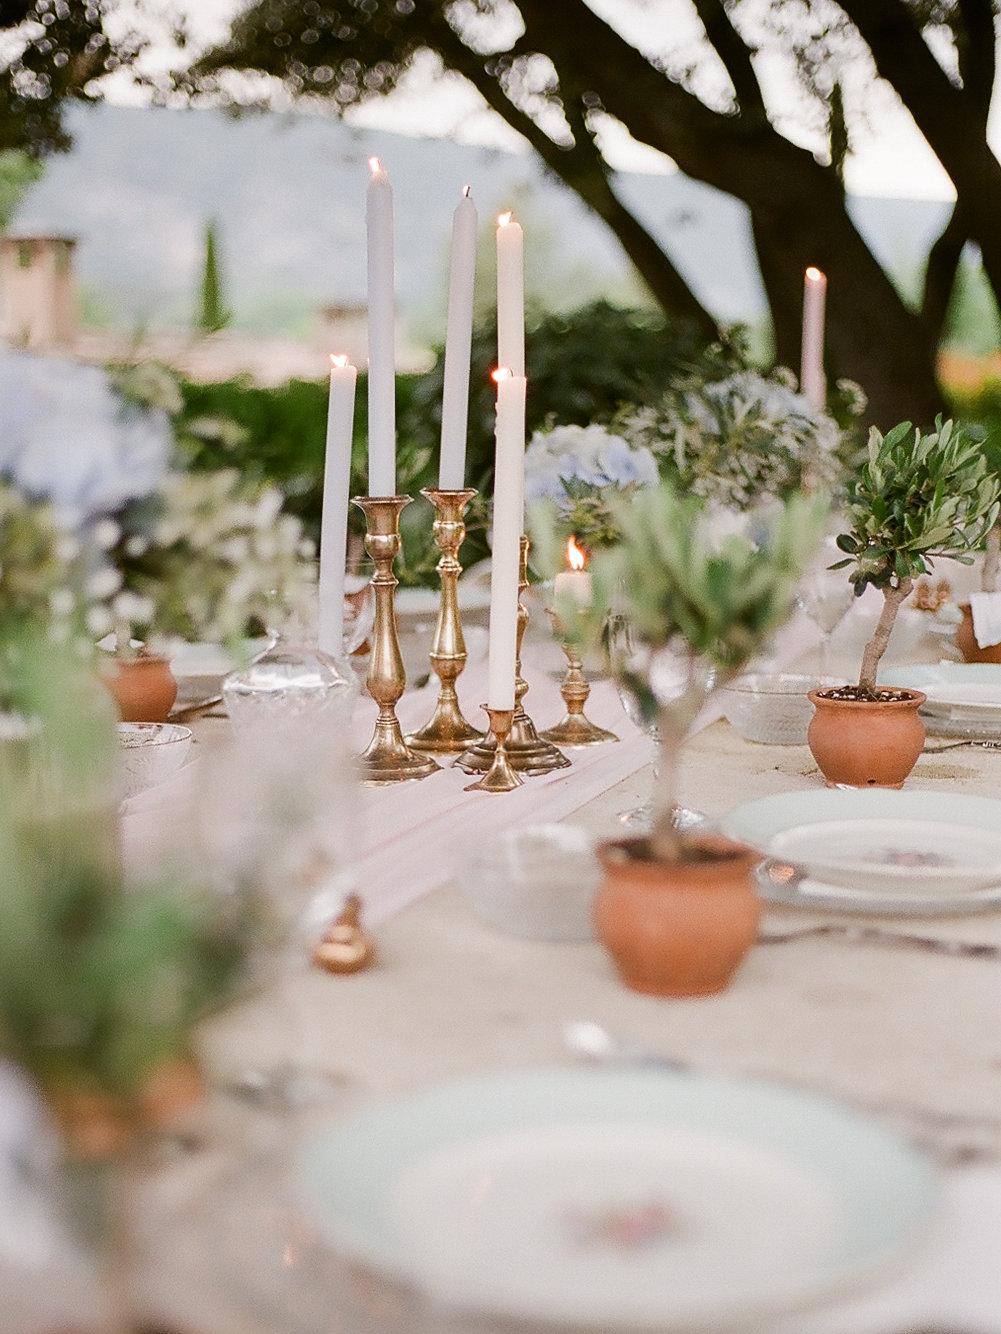 le coeur dans les etoiles - wedding planner - provence - luberon - alpilles - drome - vaucluse - sardaigne - italie - organisation - mariage - shooting - dolce vita - valery villard-416